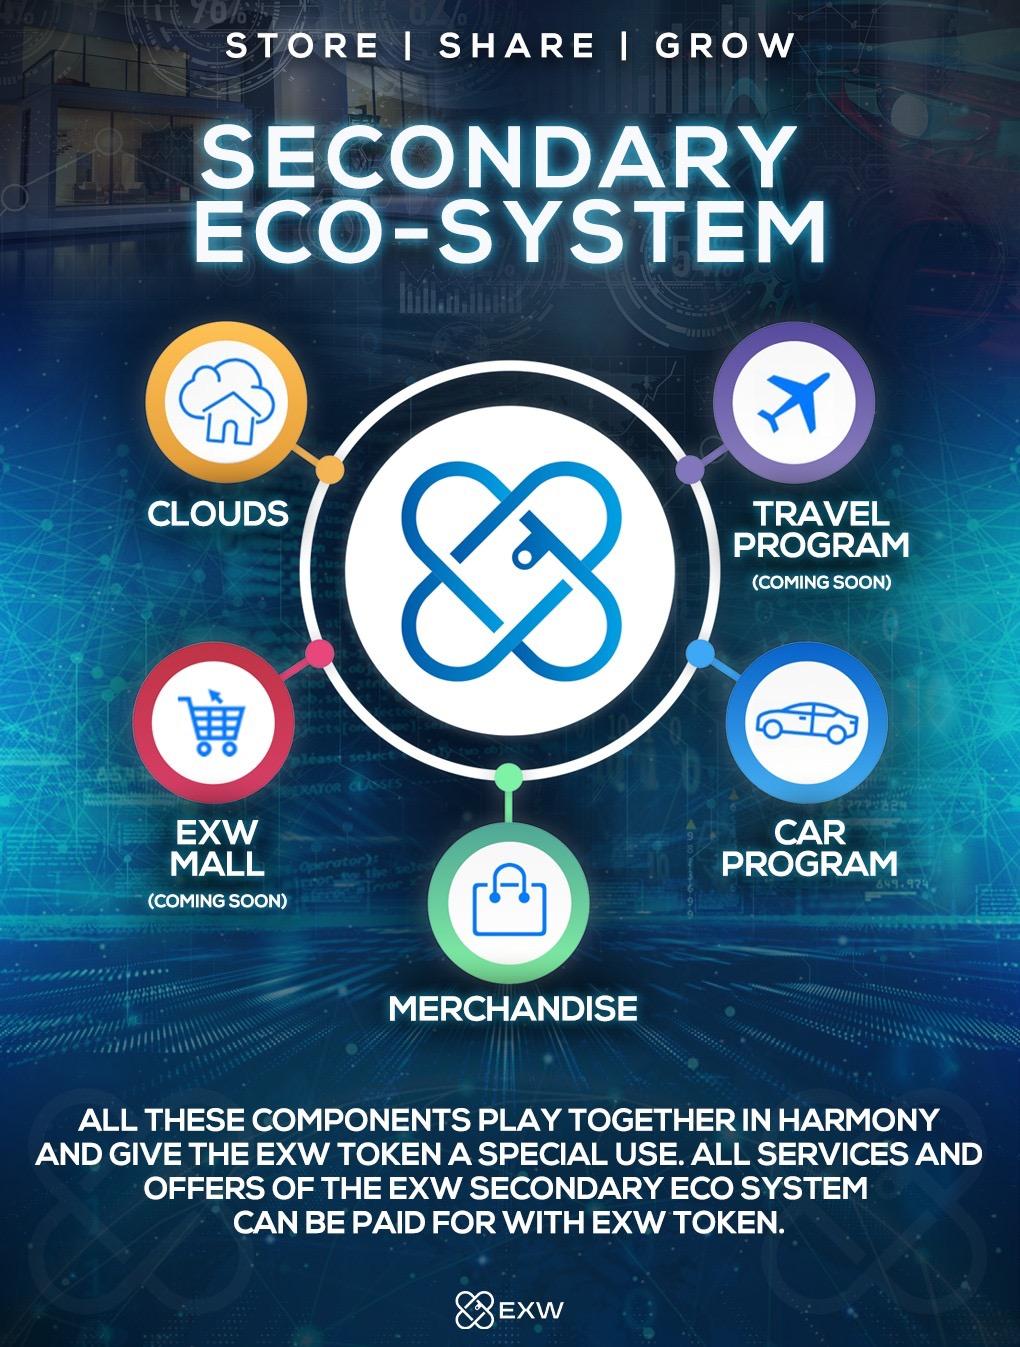 ecosistemasecondario_nuovo